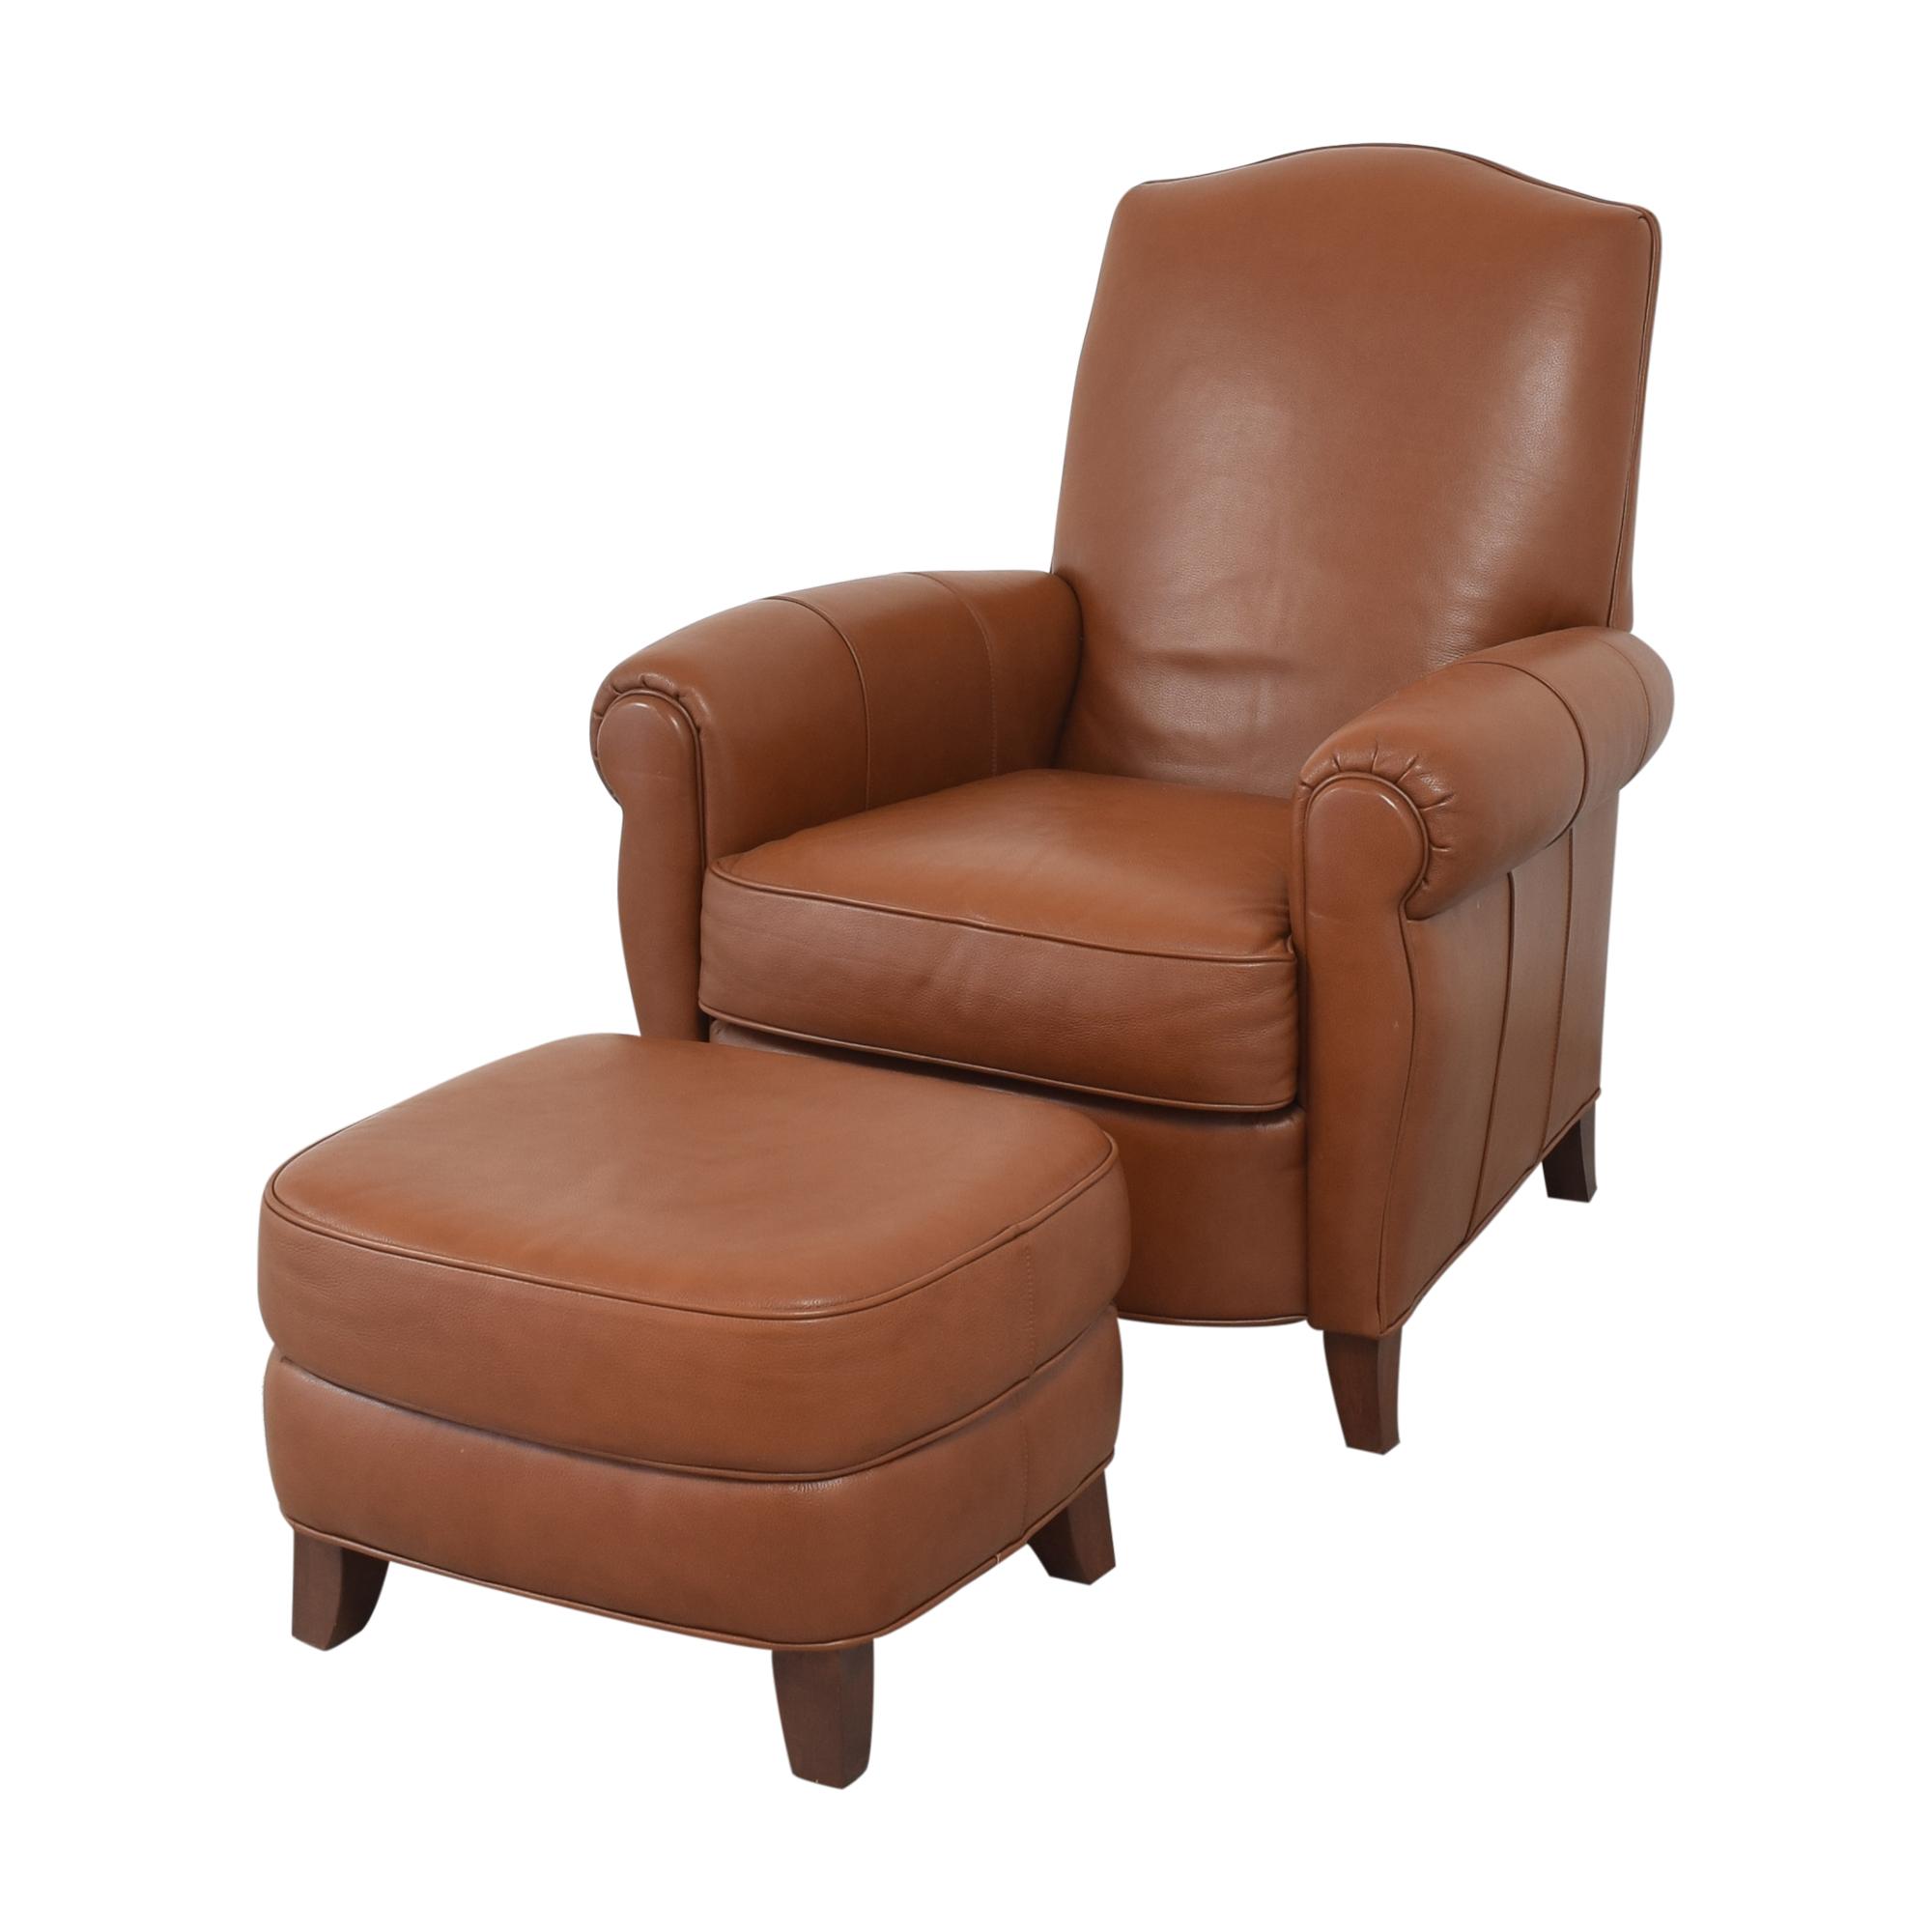 Ethan Allen Ethan Allen Roll Arm Chair with Ottoman price